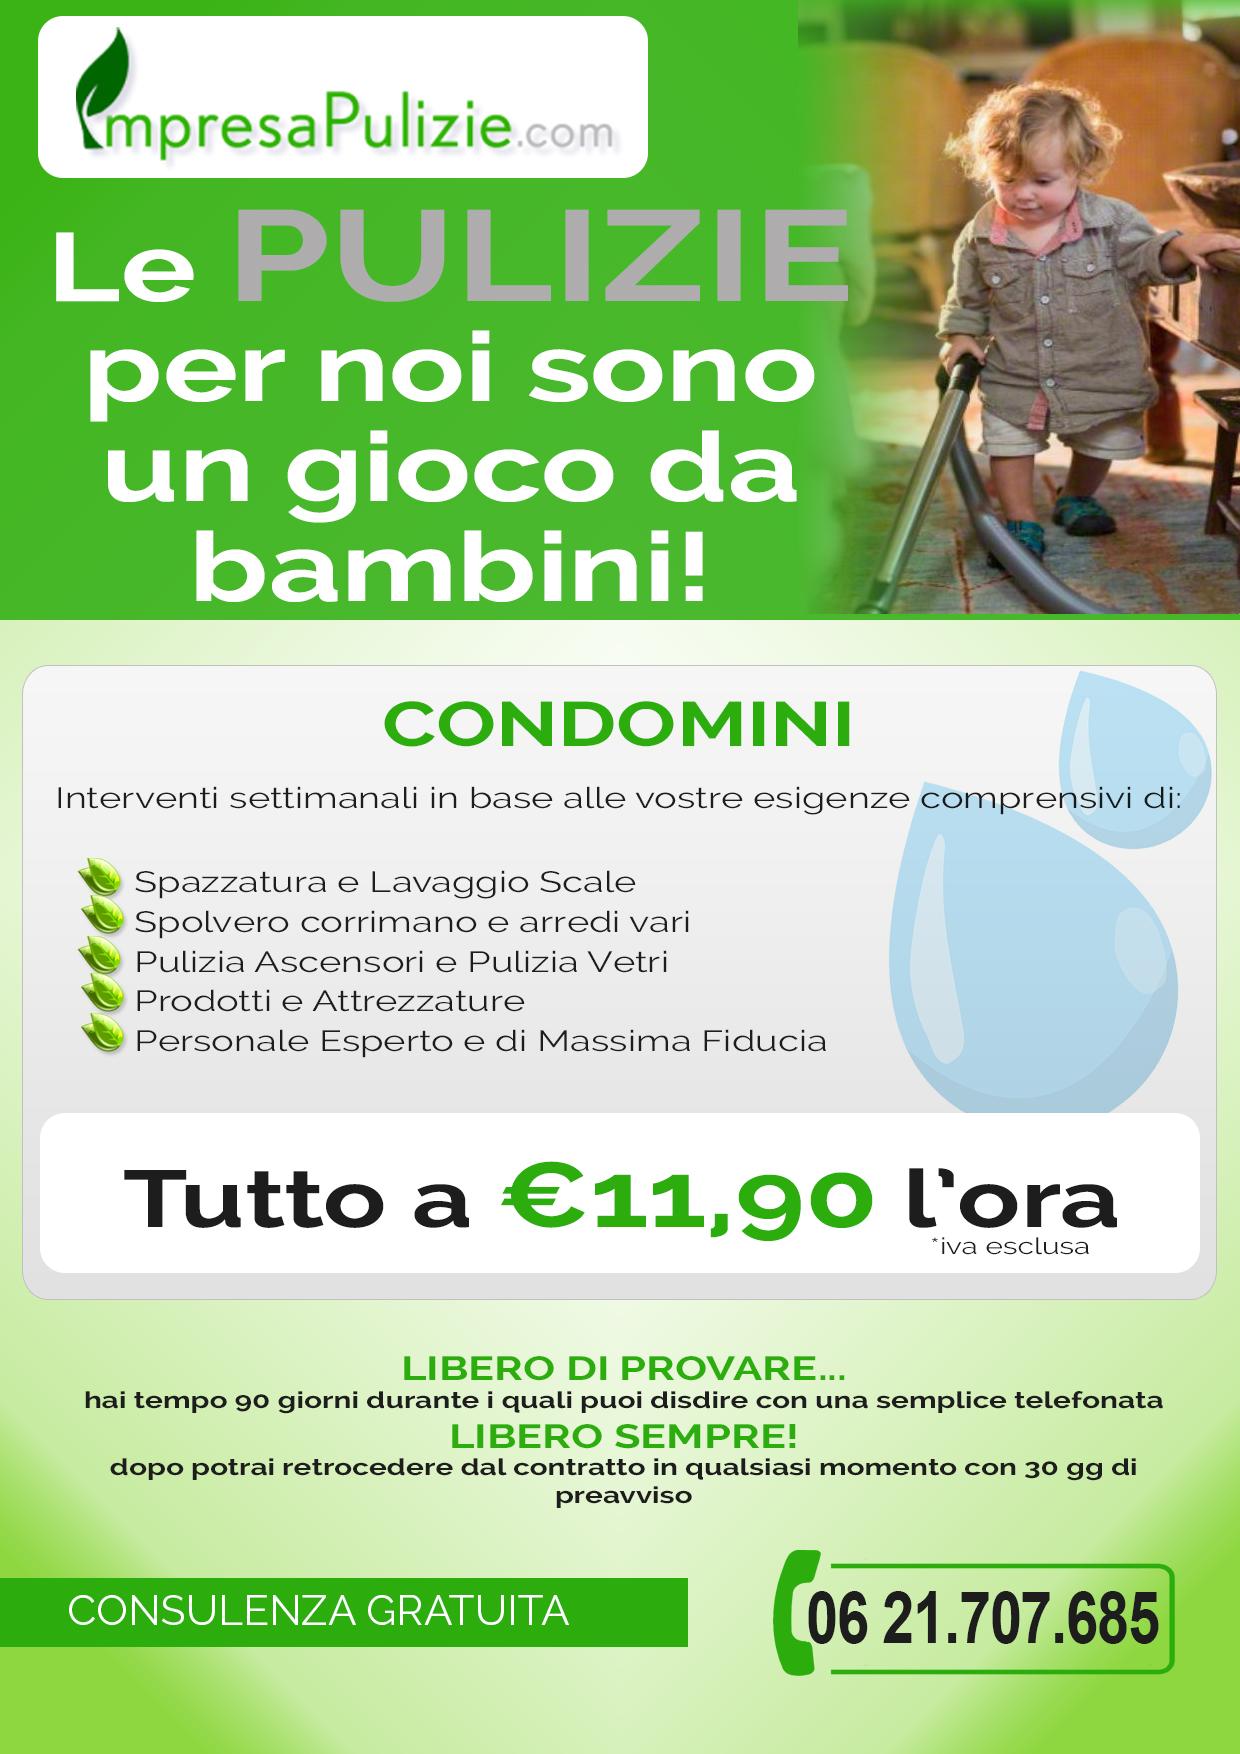 Richiesta Preventivo - Condomini - ImpresaPulizie.com